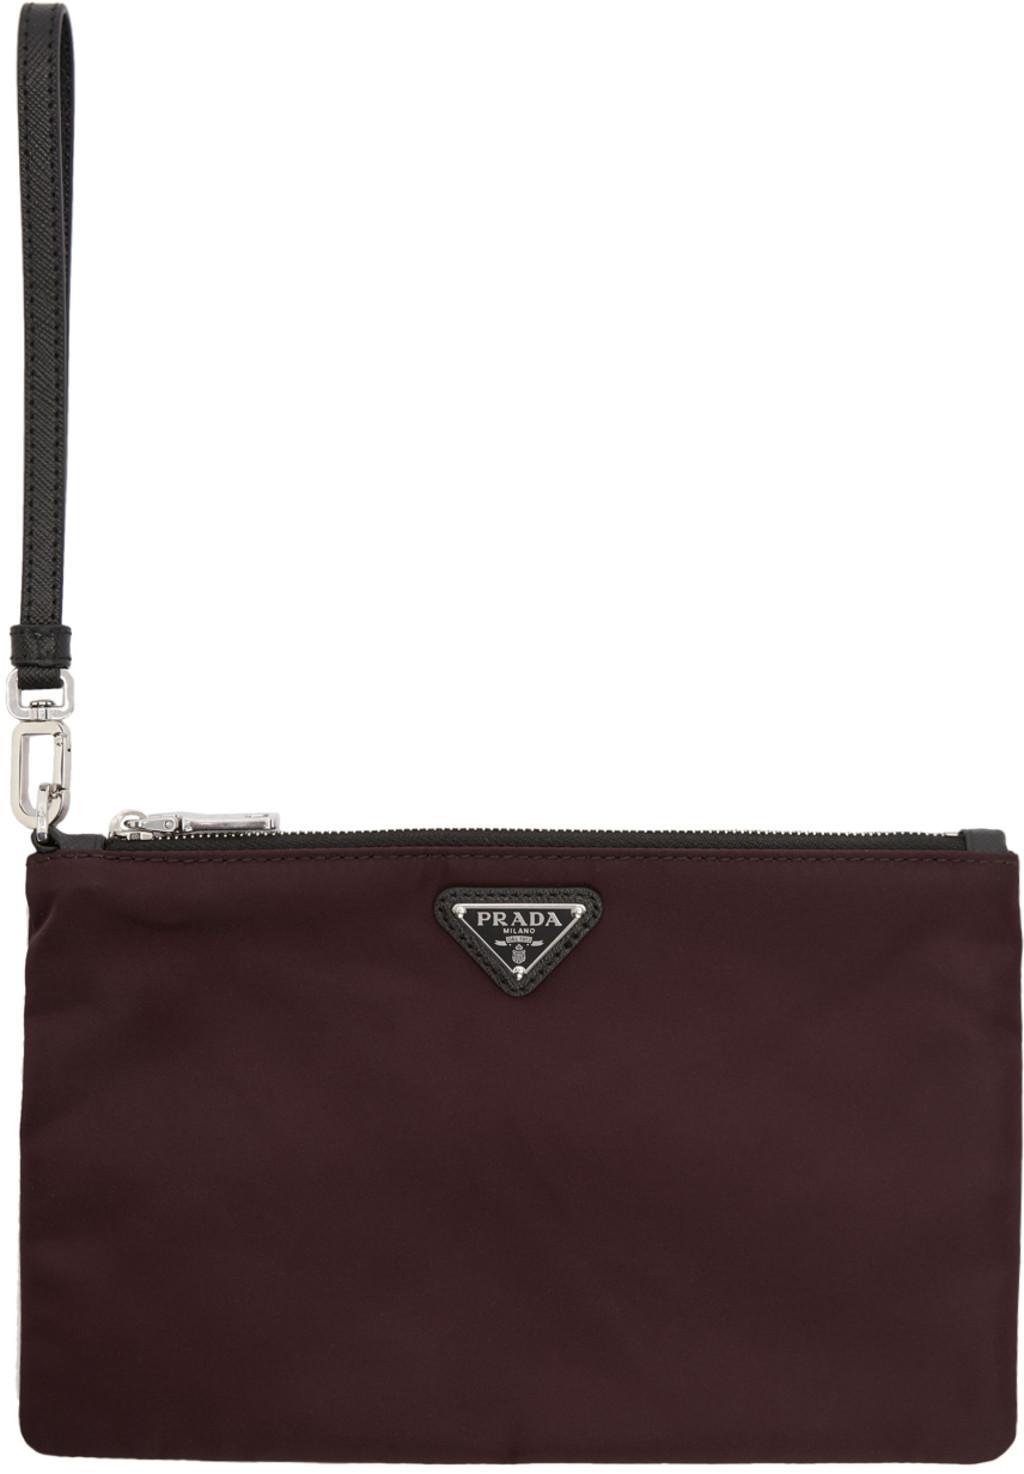 ... discount code for prada bags for men ssense f2095 c88fa australia prada  mens ... 5241b47a45f1c